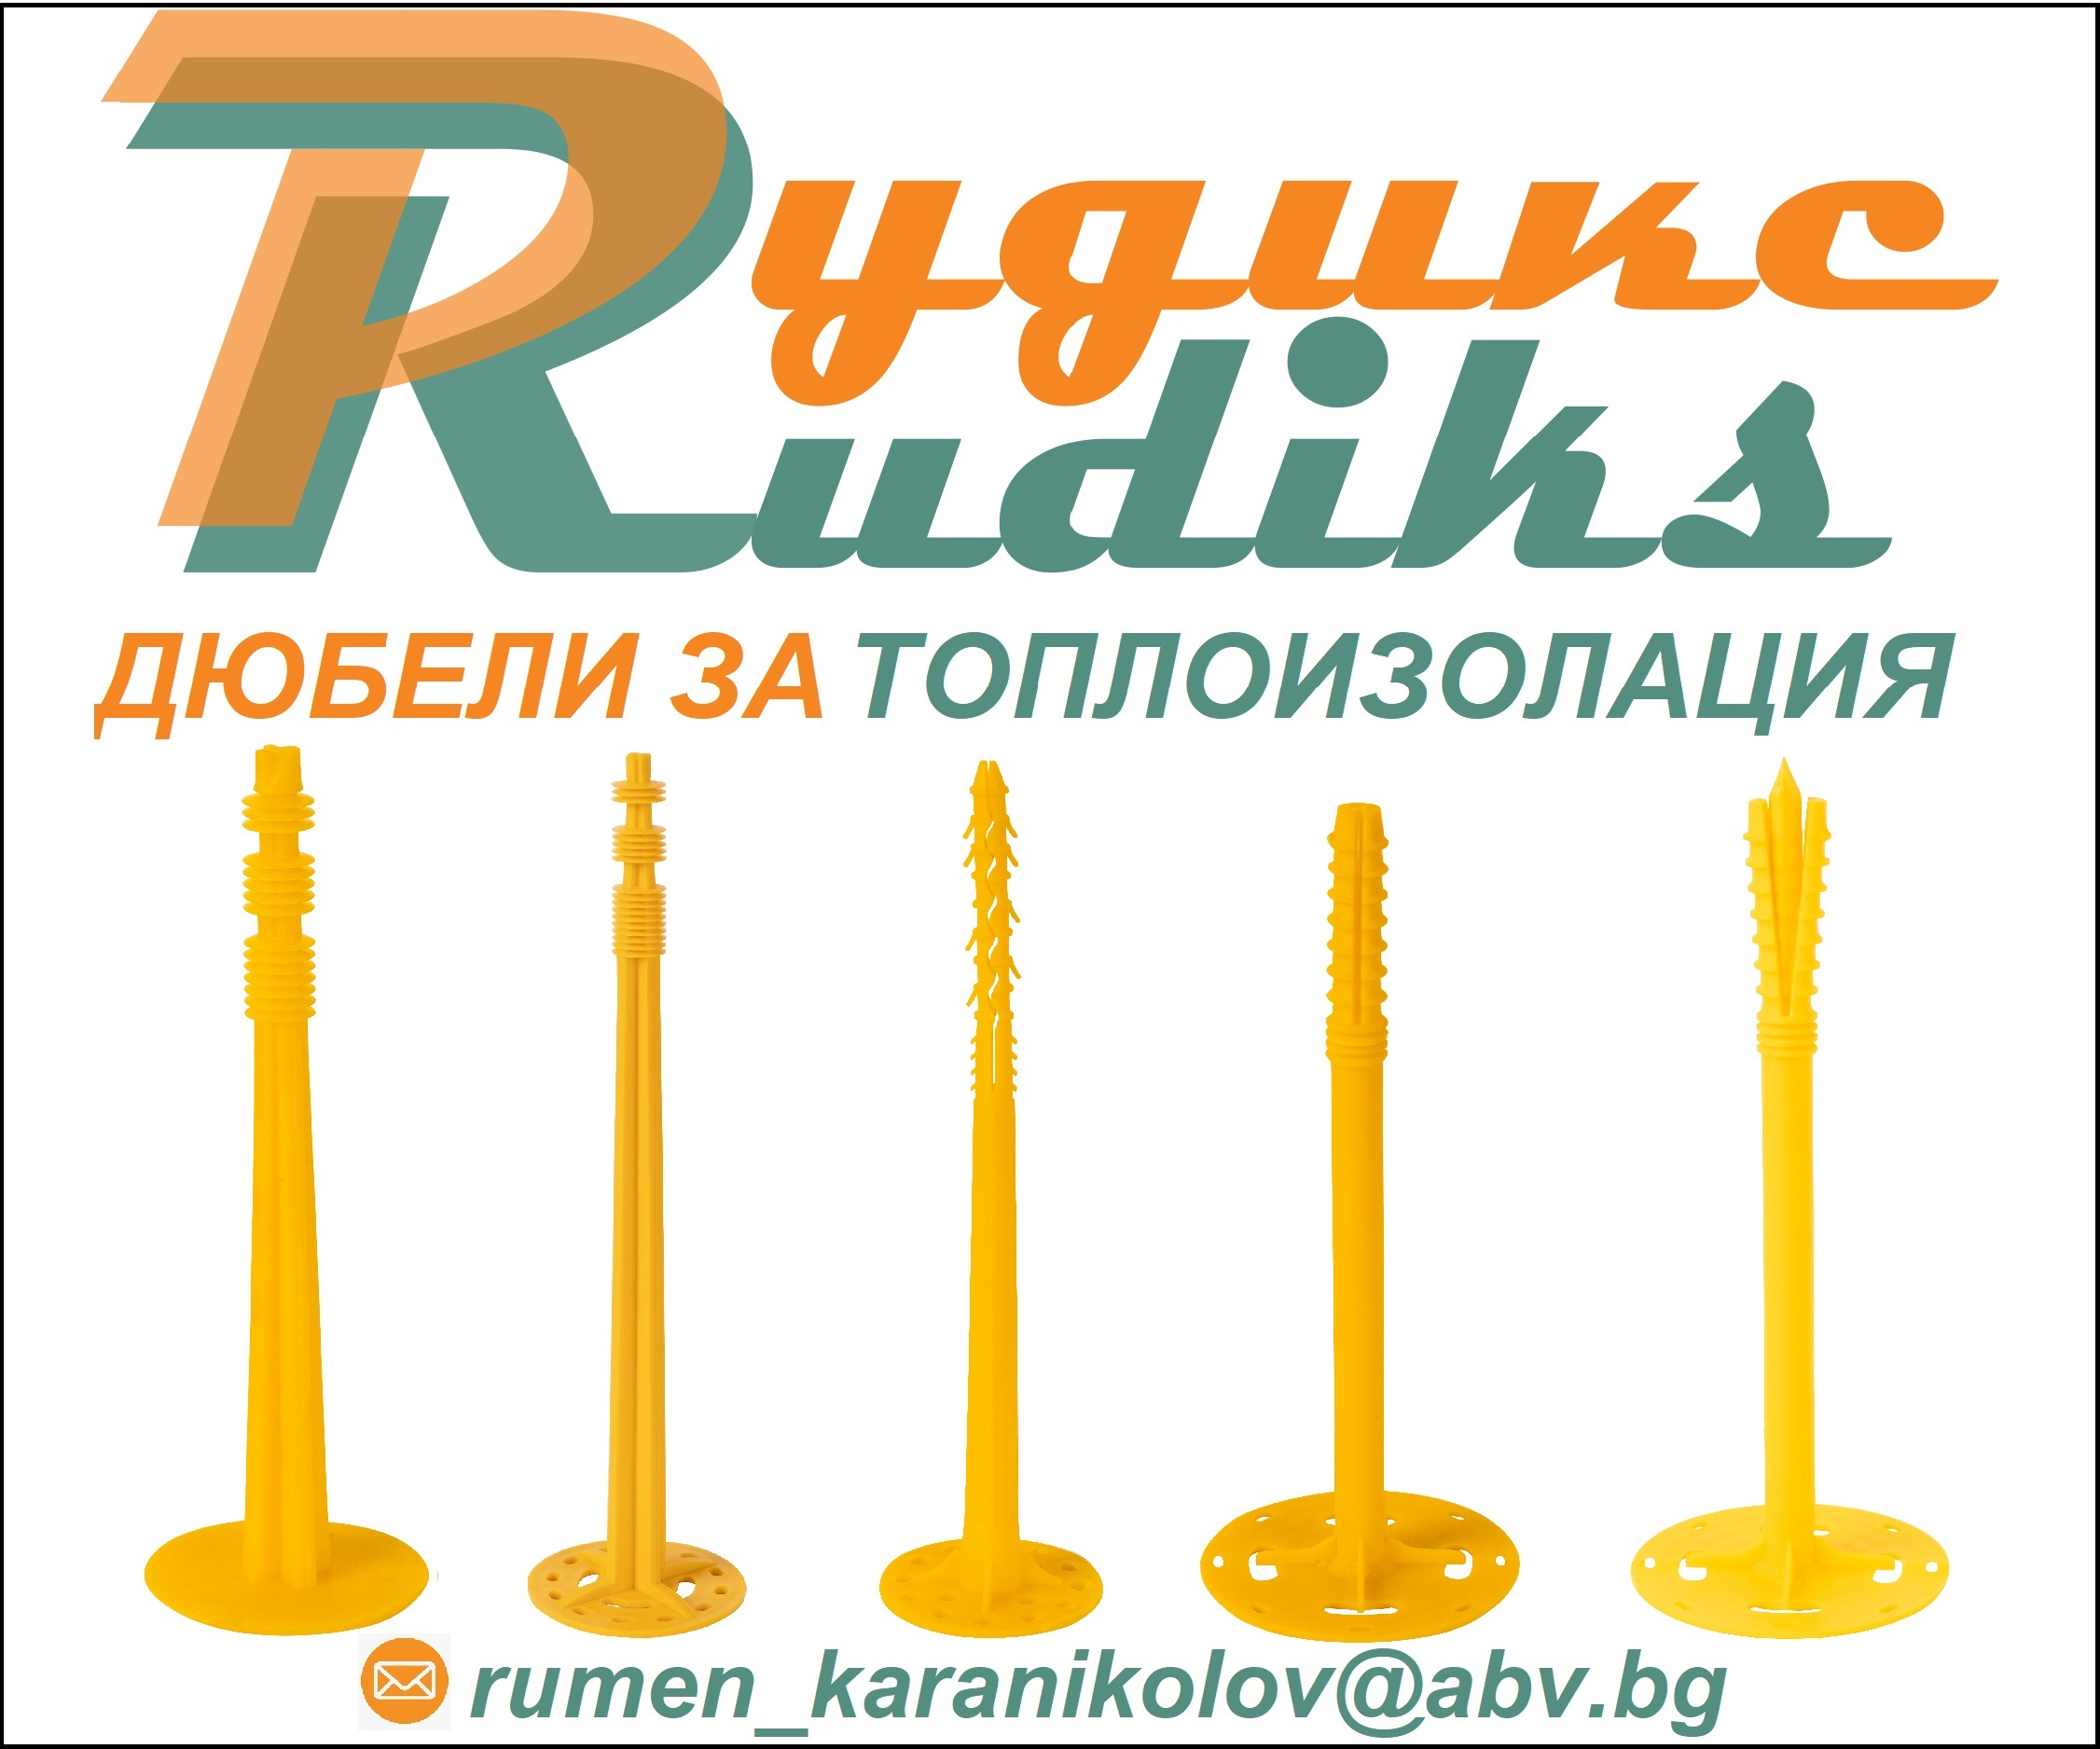 Рудикс ЕООД - Дюбели за топлоизолациoнни системи